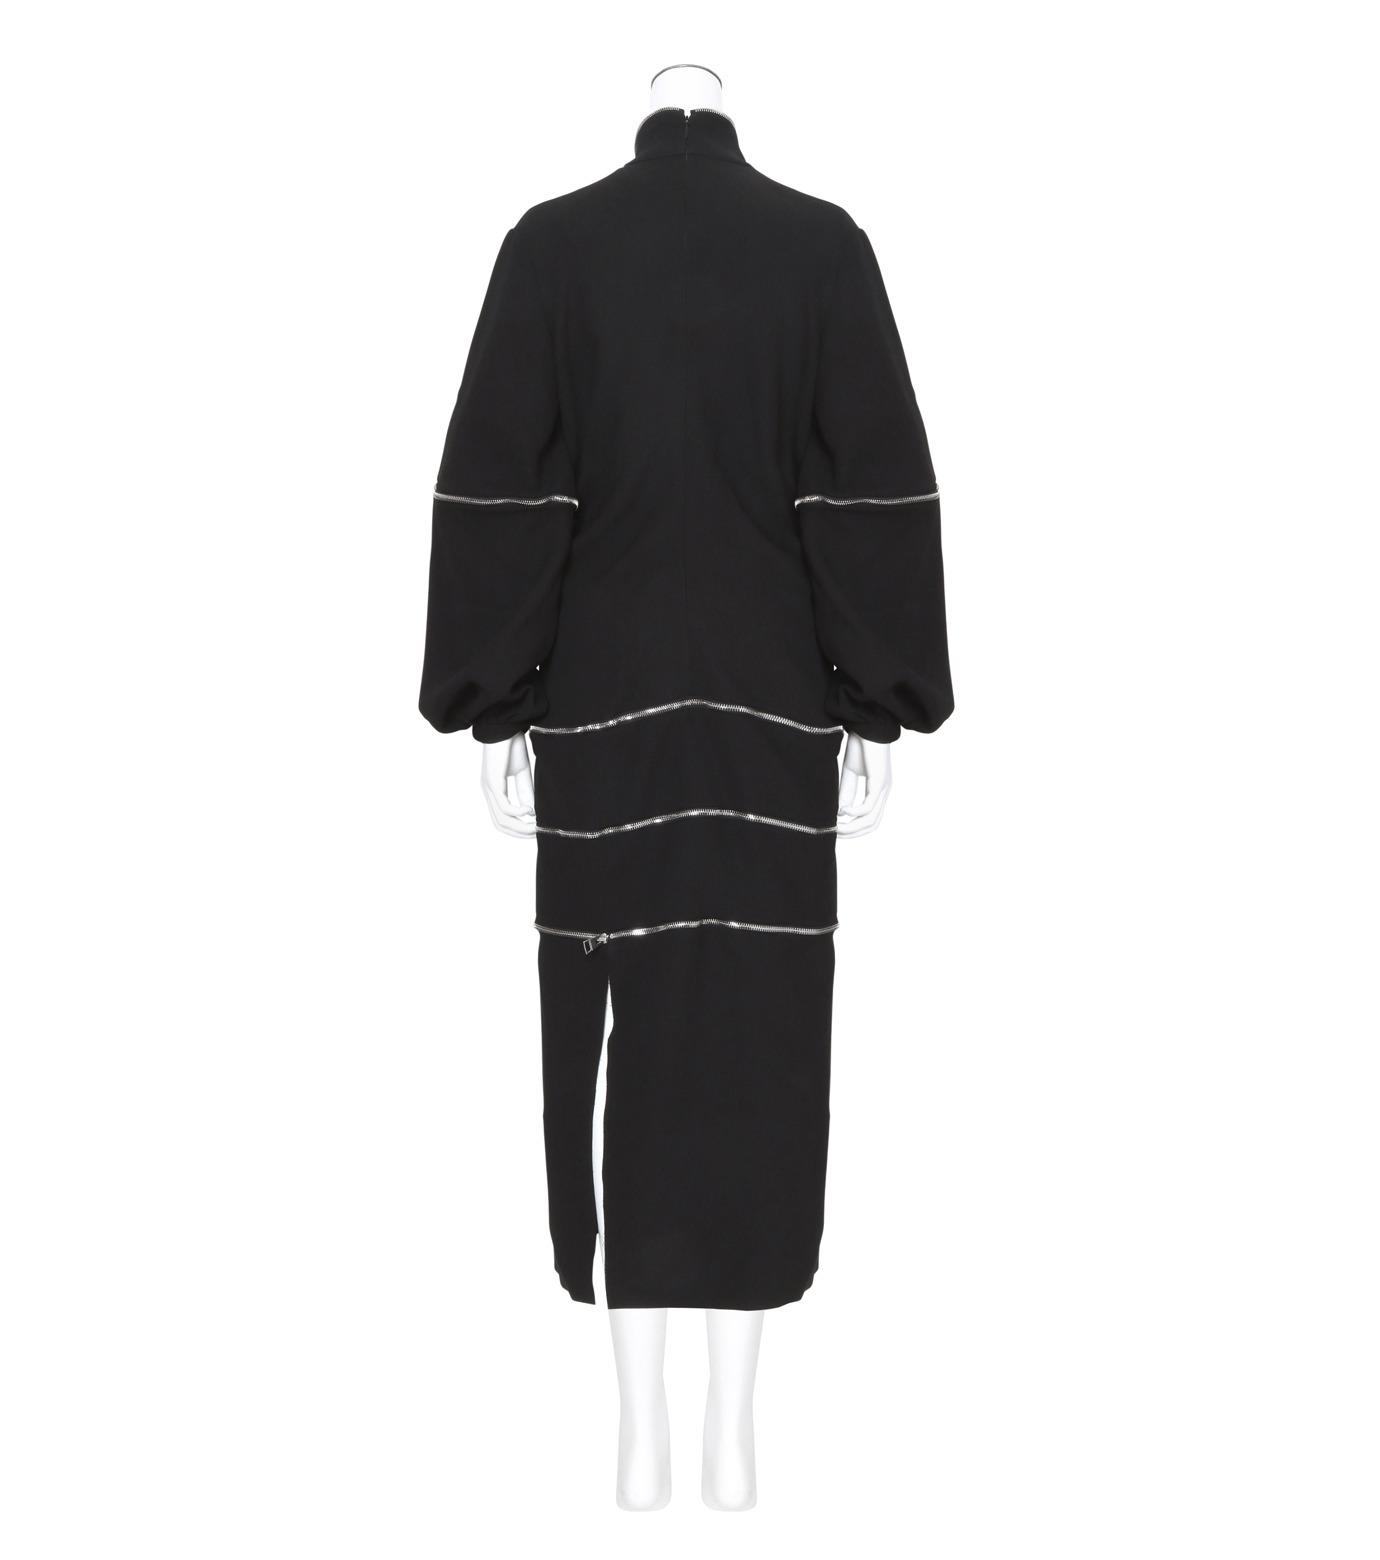 J.W.Anderson(ジェイダブリュー アンダーソン)のGathered Midi Dress-BLACK(ワンピース/one piece)-DR06WP16-13 拡大詳細画像2